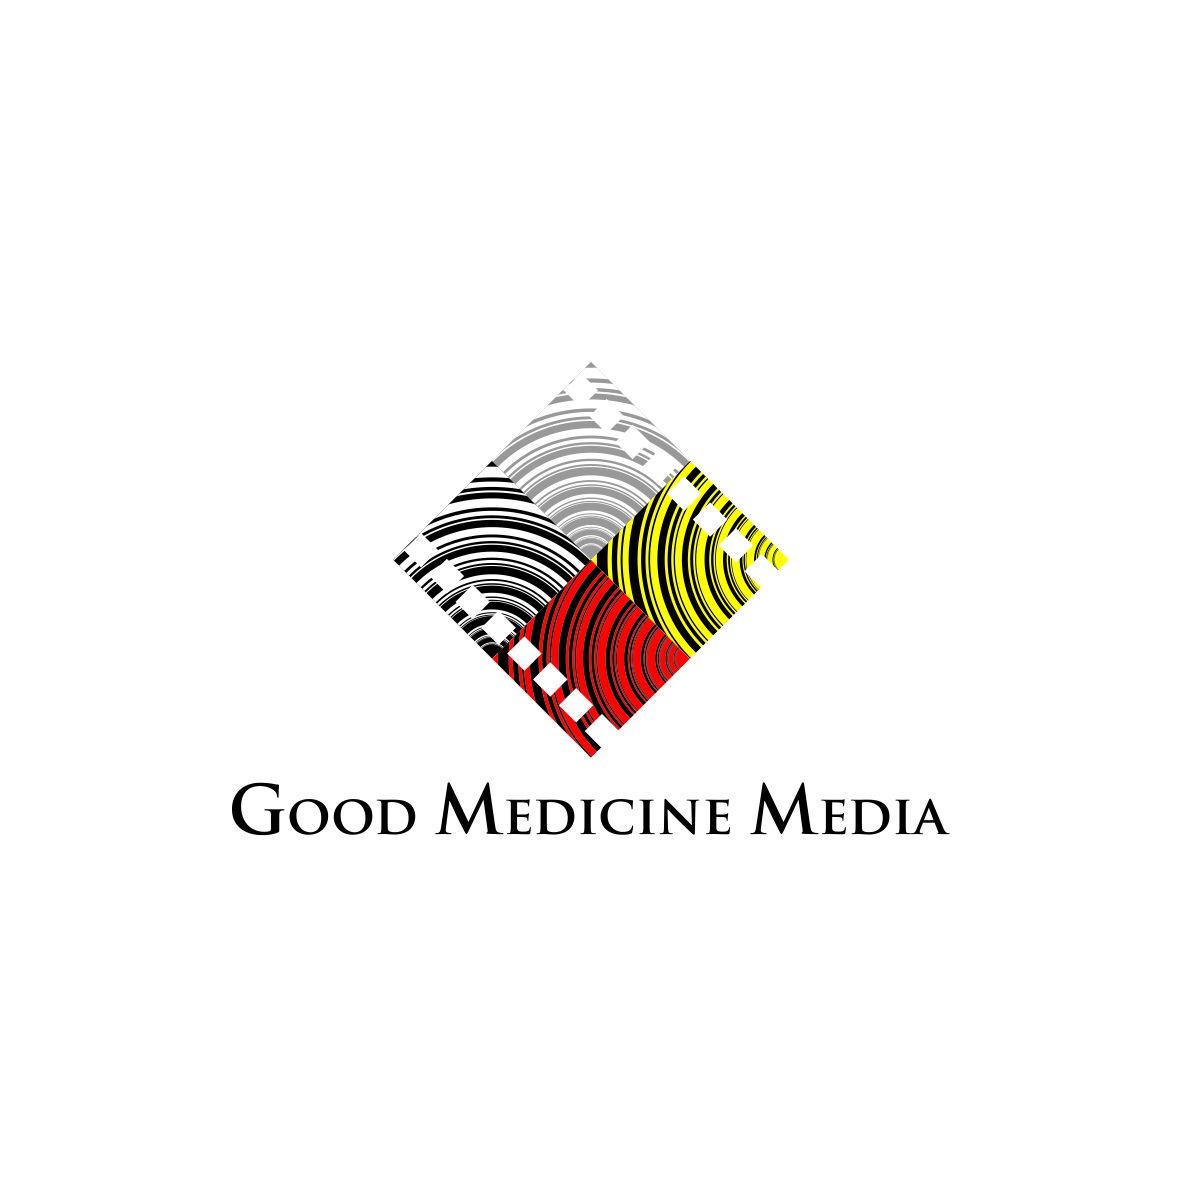 Logo Design by arteo_design - Entry No. 65 in the Logo Design Contest Good Medicine Media Logo Design.